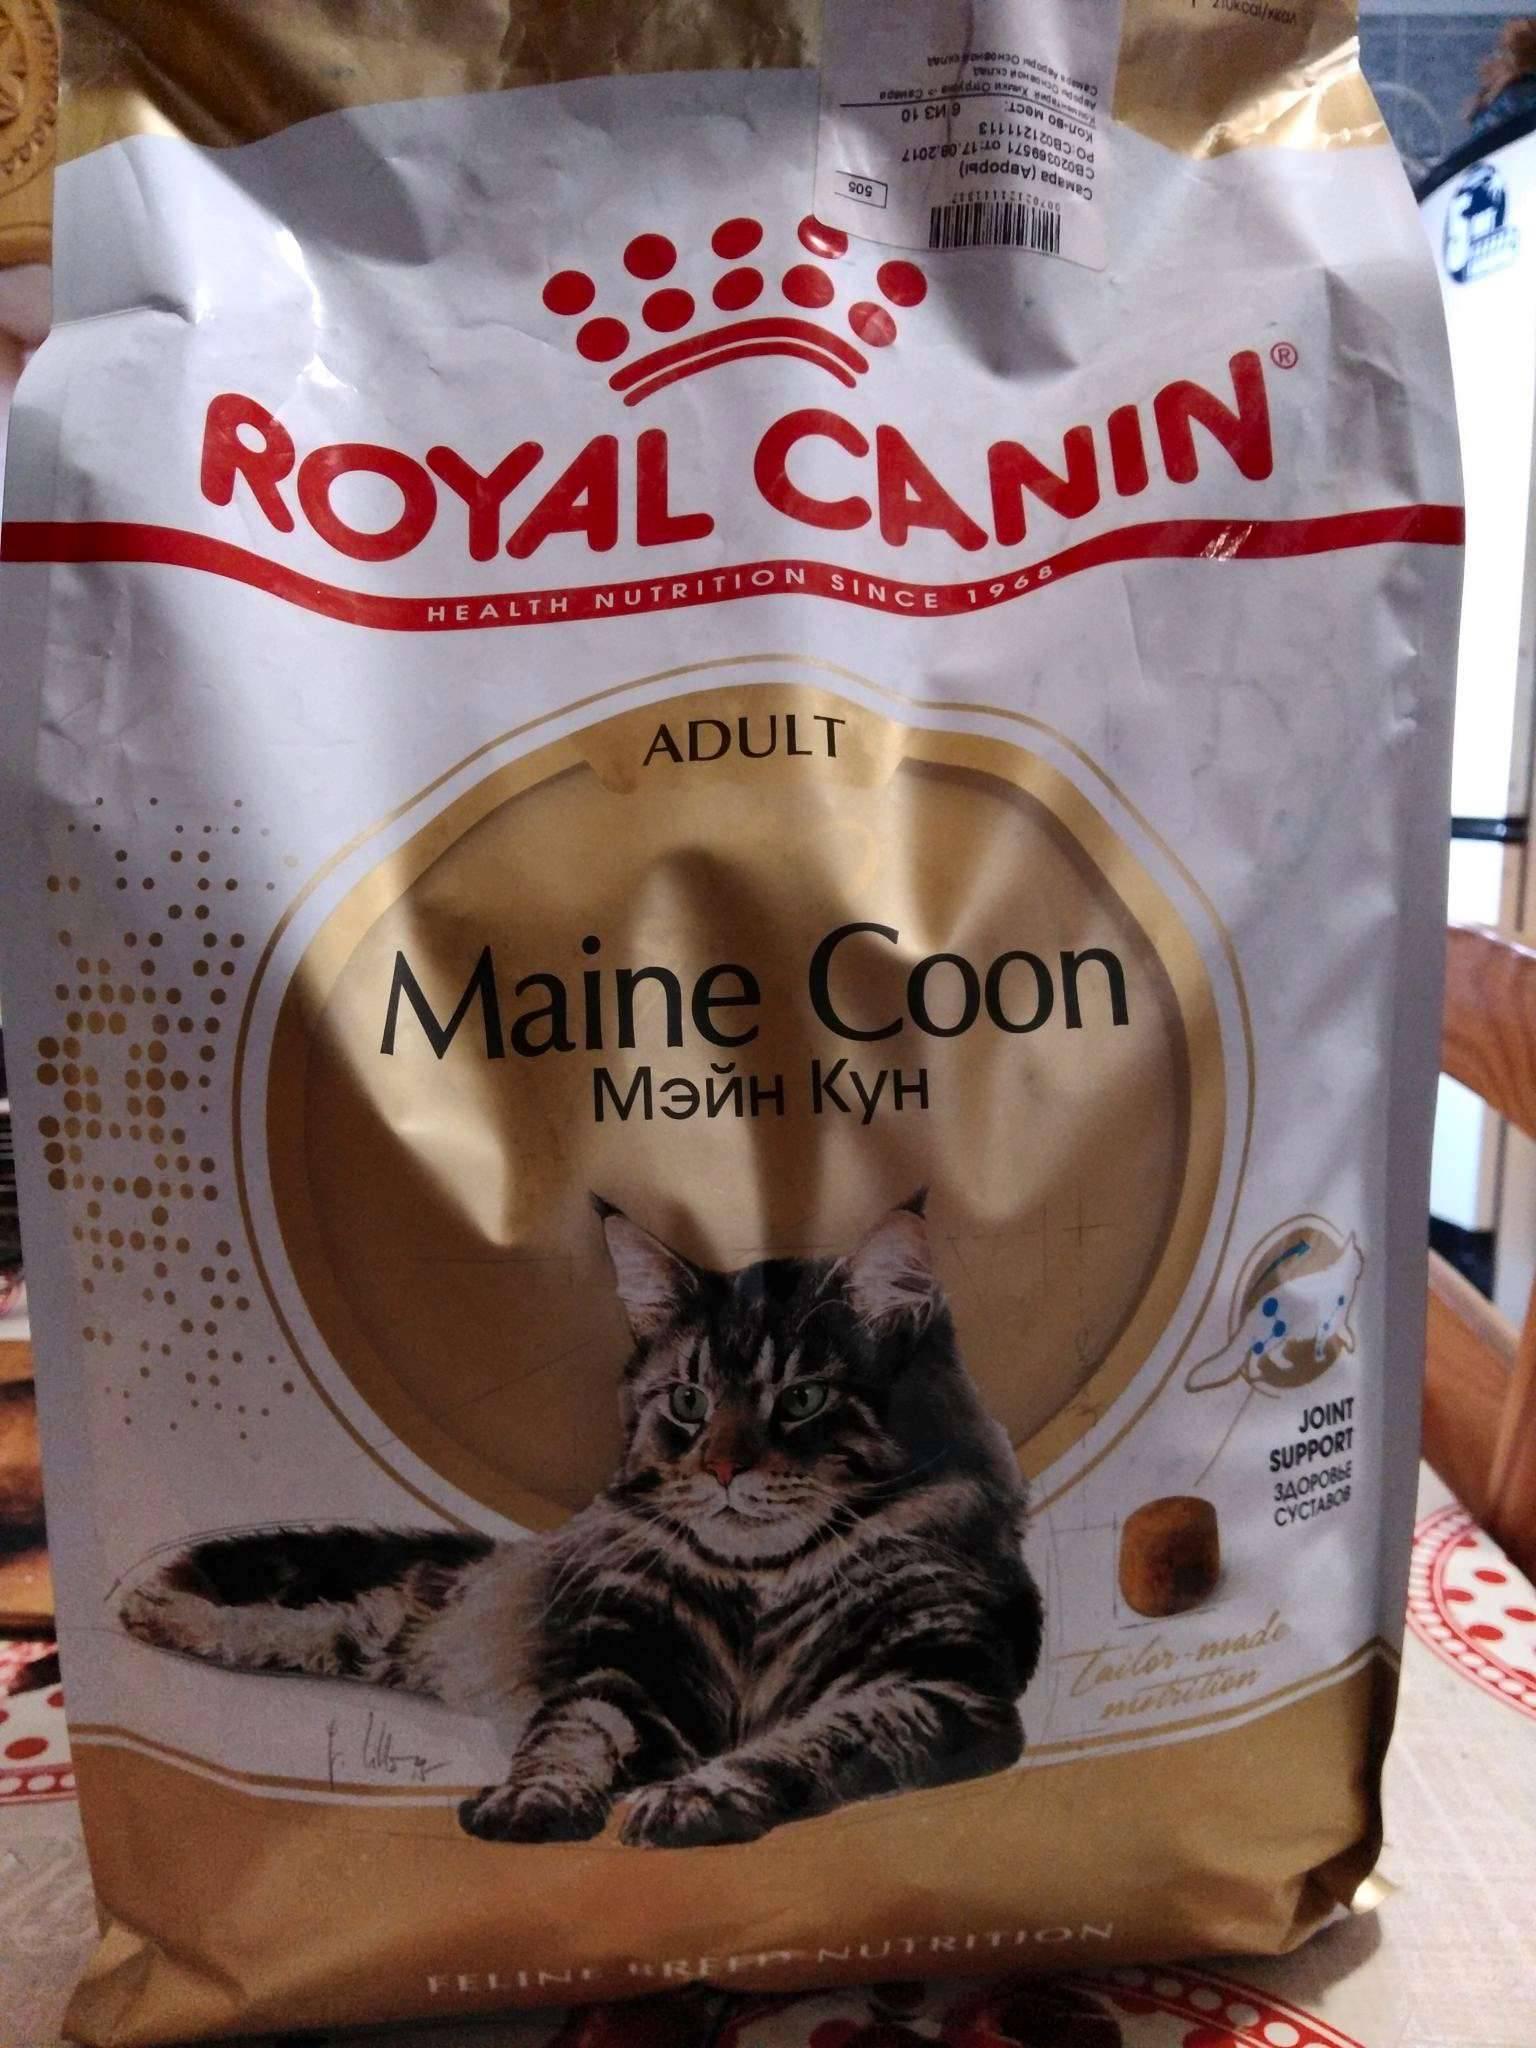 Корм для кошек karmy: отзывы, разбор состава, цена - петобзор